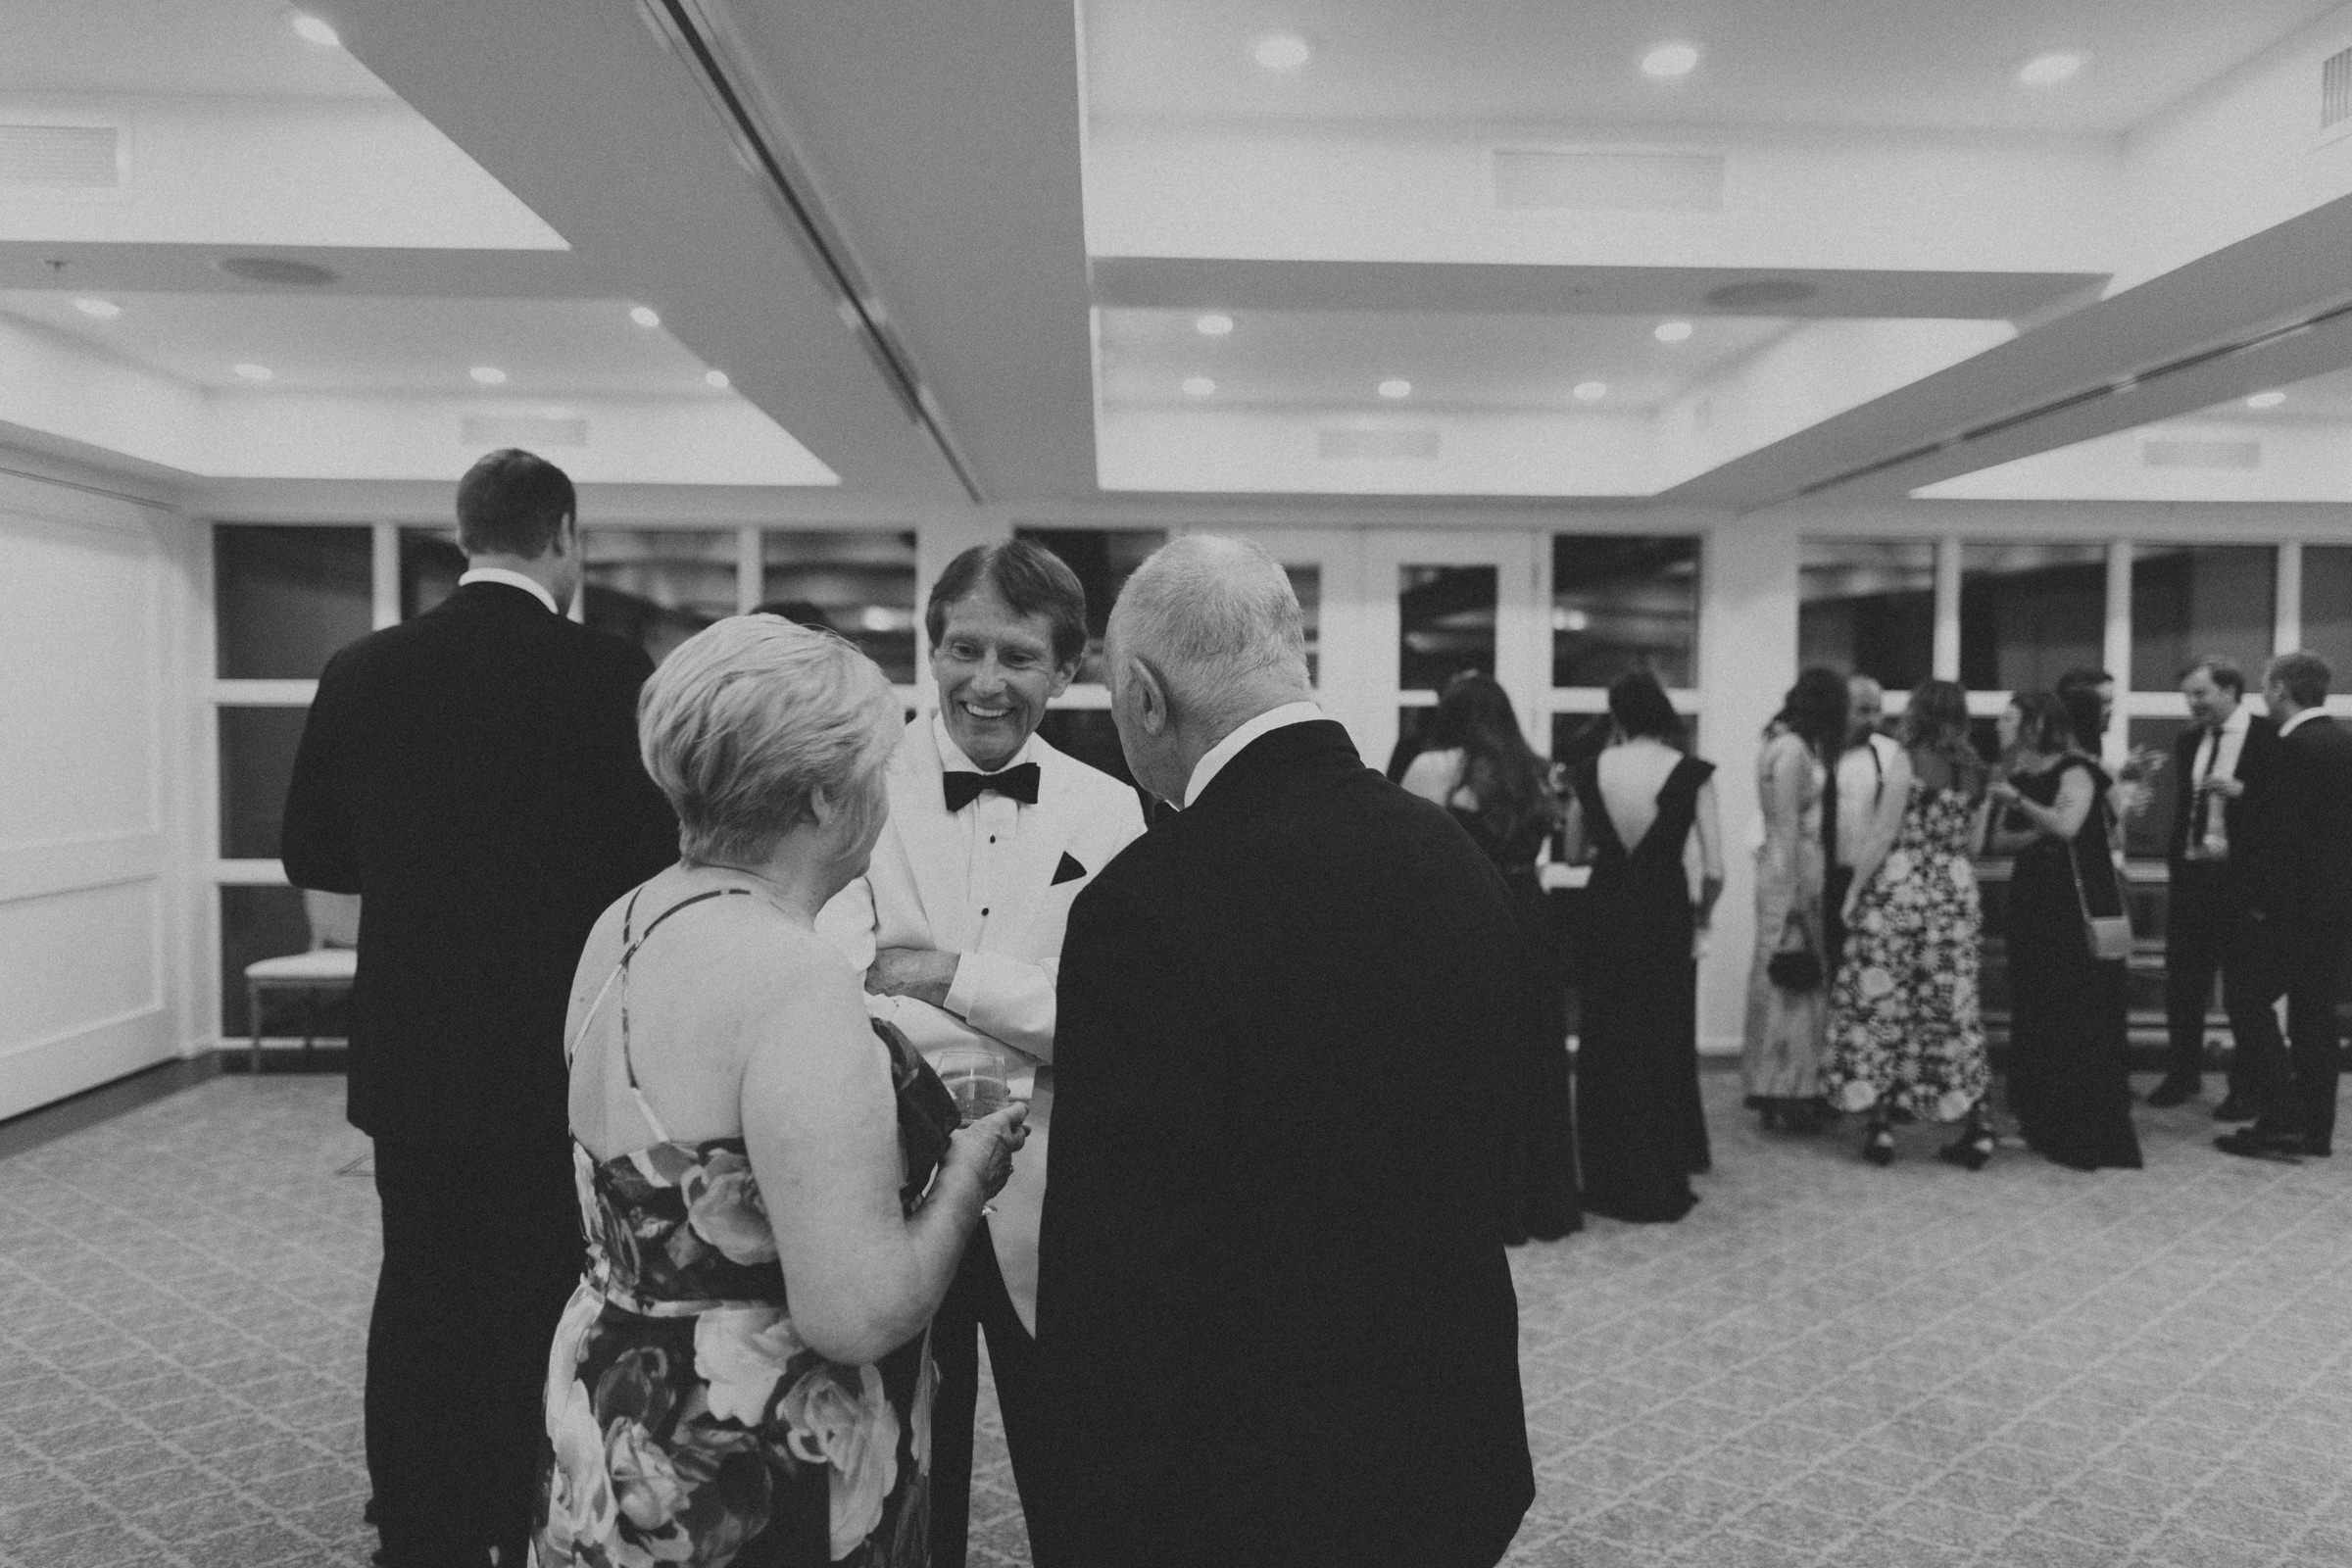 Langdon-Hall-wedding-photography-Cambridge-by-Sam-Wong-of-Visual-Cravings_Sarah-Ryan_57.jpg